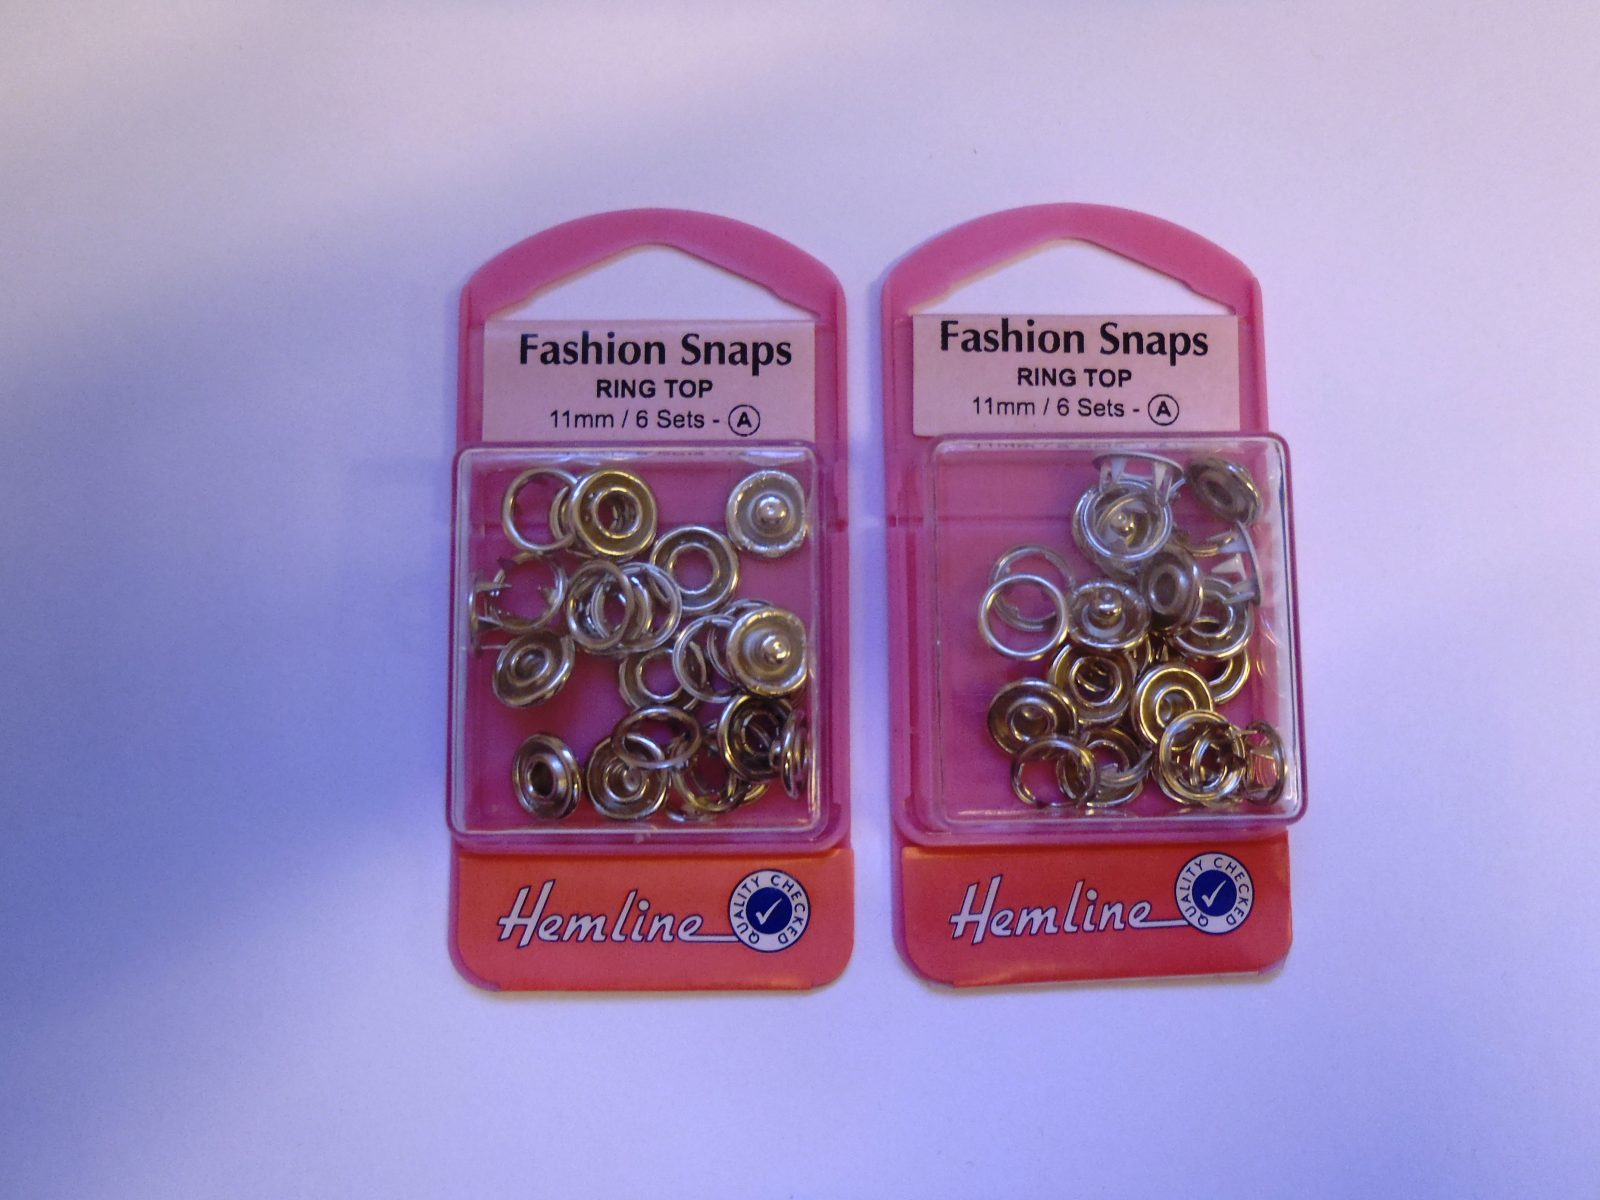 Hemline Gold Ring Top 11mm 6 Sets Fashion Snaps